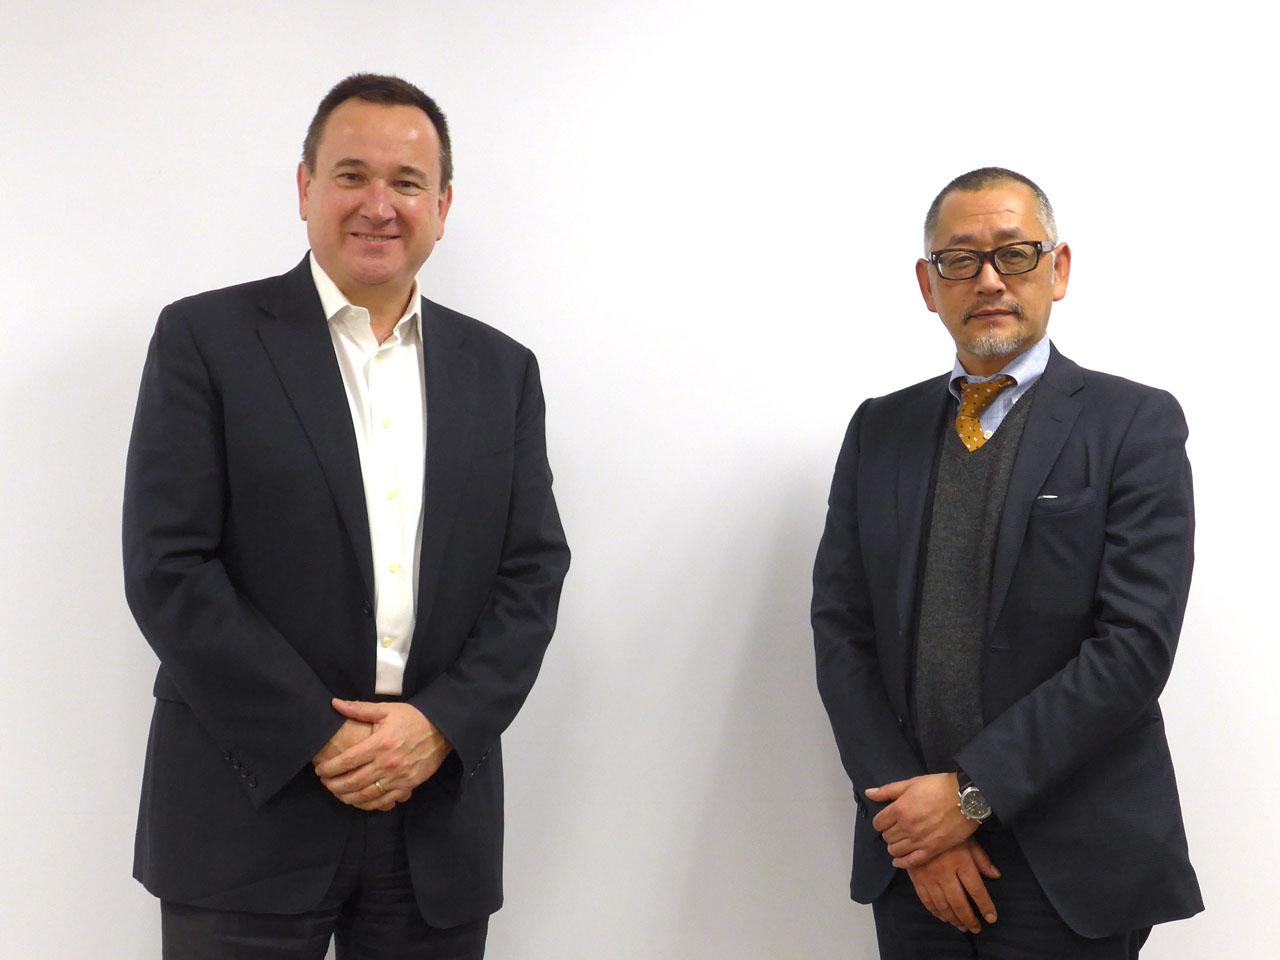 Ruckus Networks社長のイアン・ホワイティング氏(左)とRuckus Networks日本担当カントリーマネージャーの高山尚久氏(右)